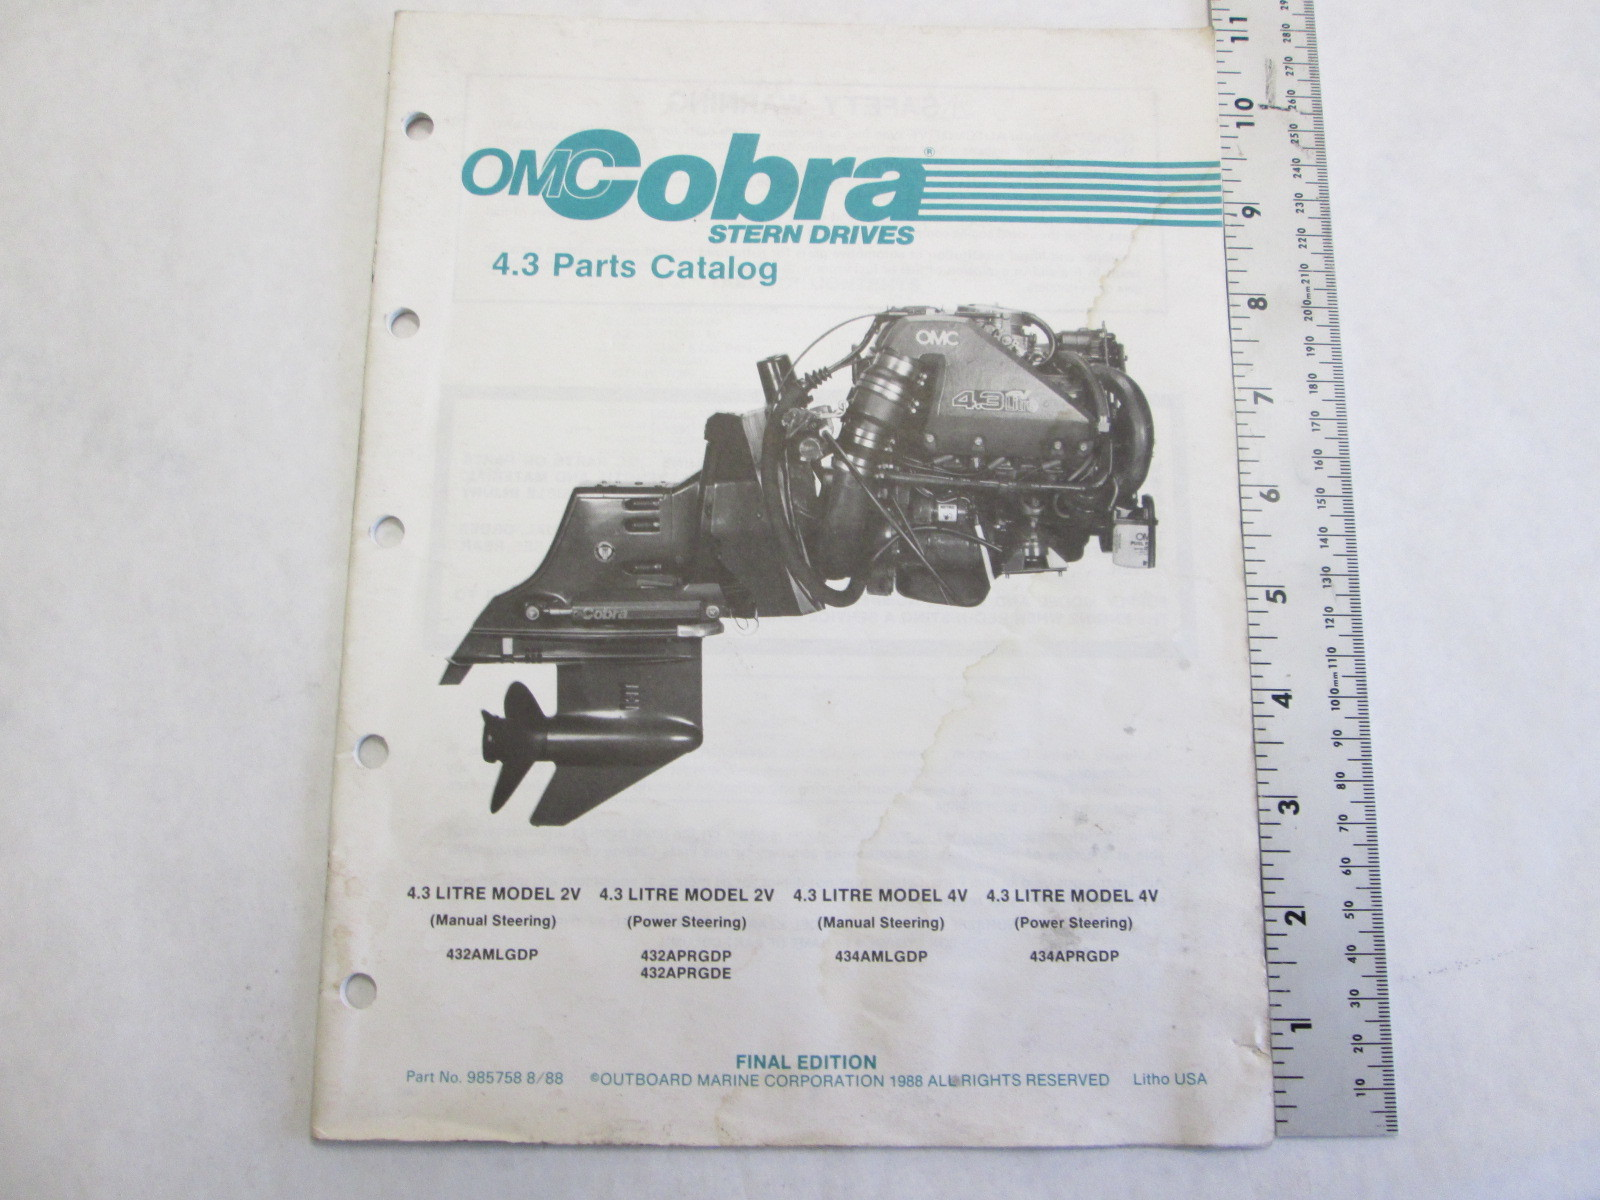 omc cobra stern drive 4 3l parts catalog 985758 green bay rh greenbayprop com omc cobra parts catalog omc sterndrive parts catalog